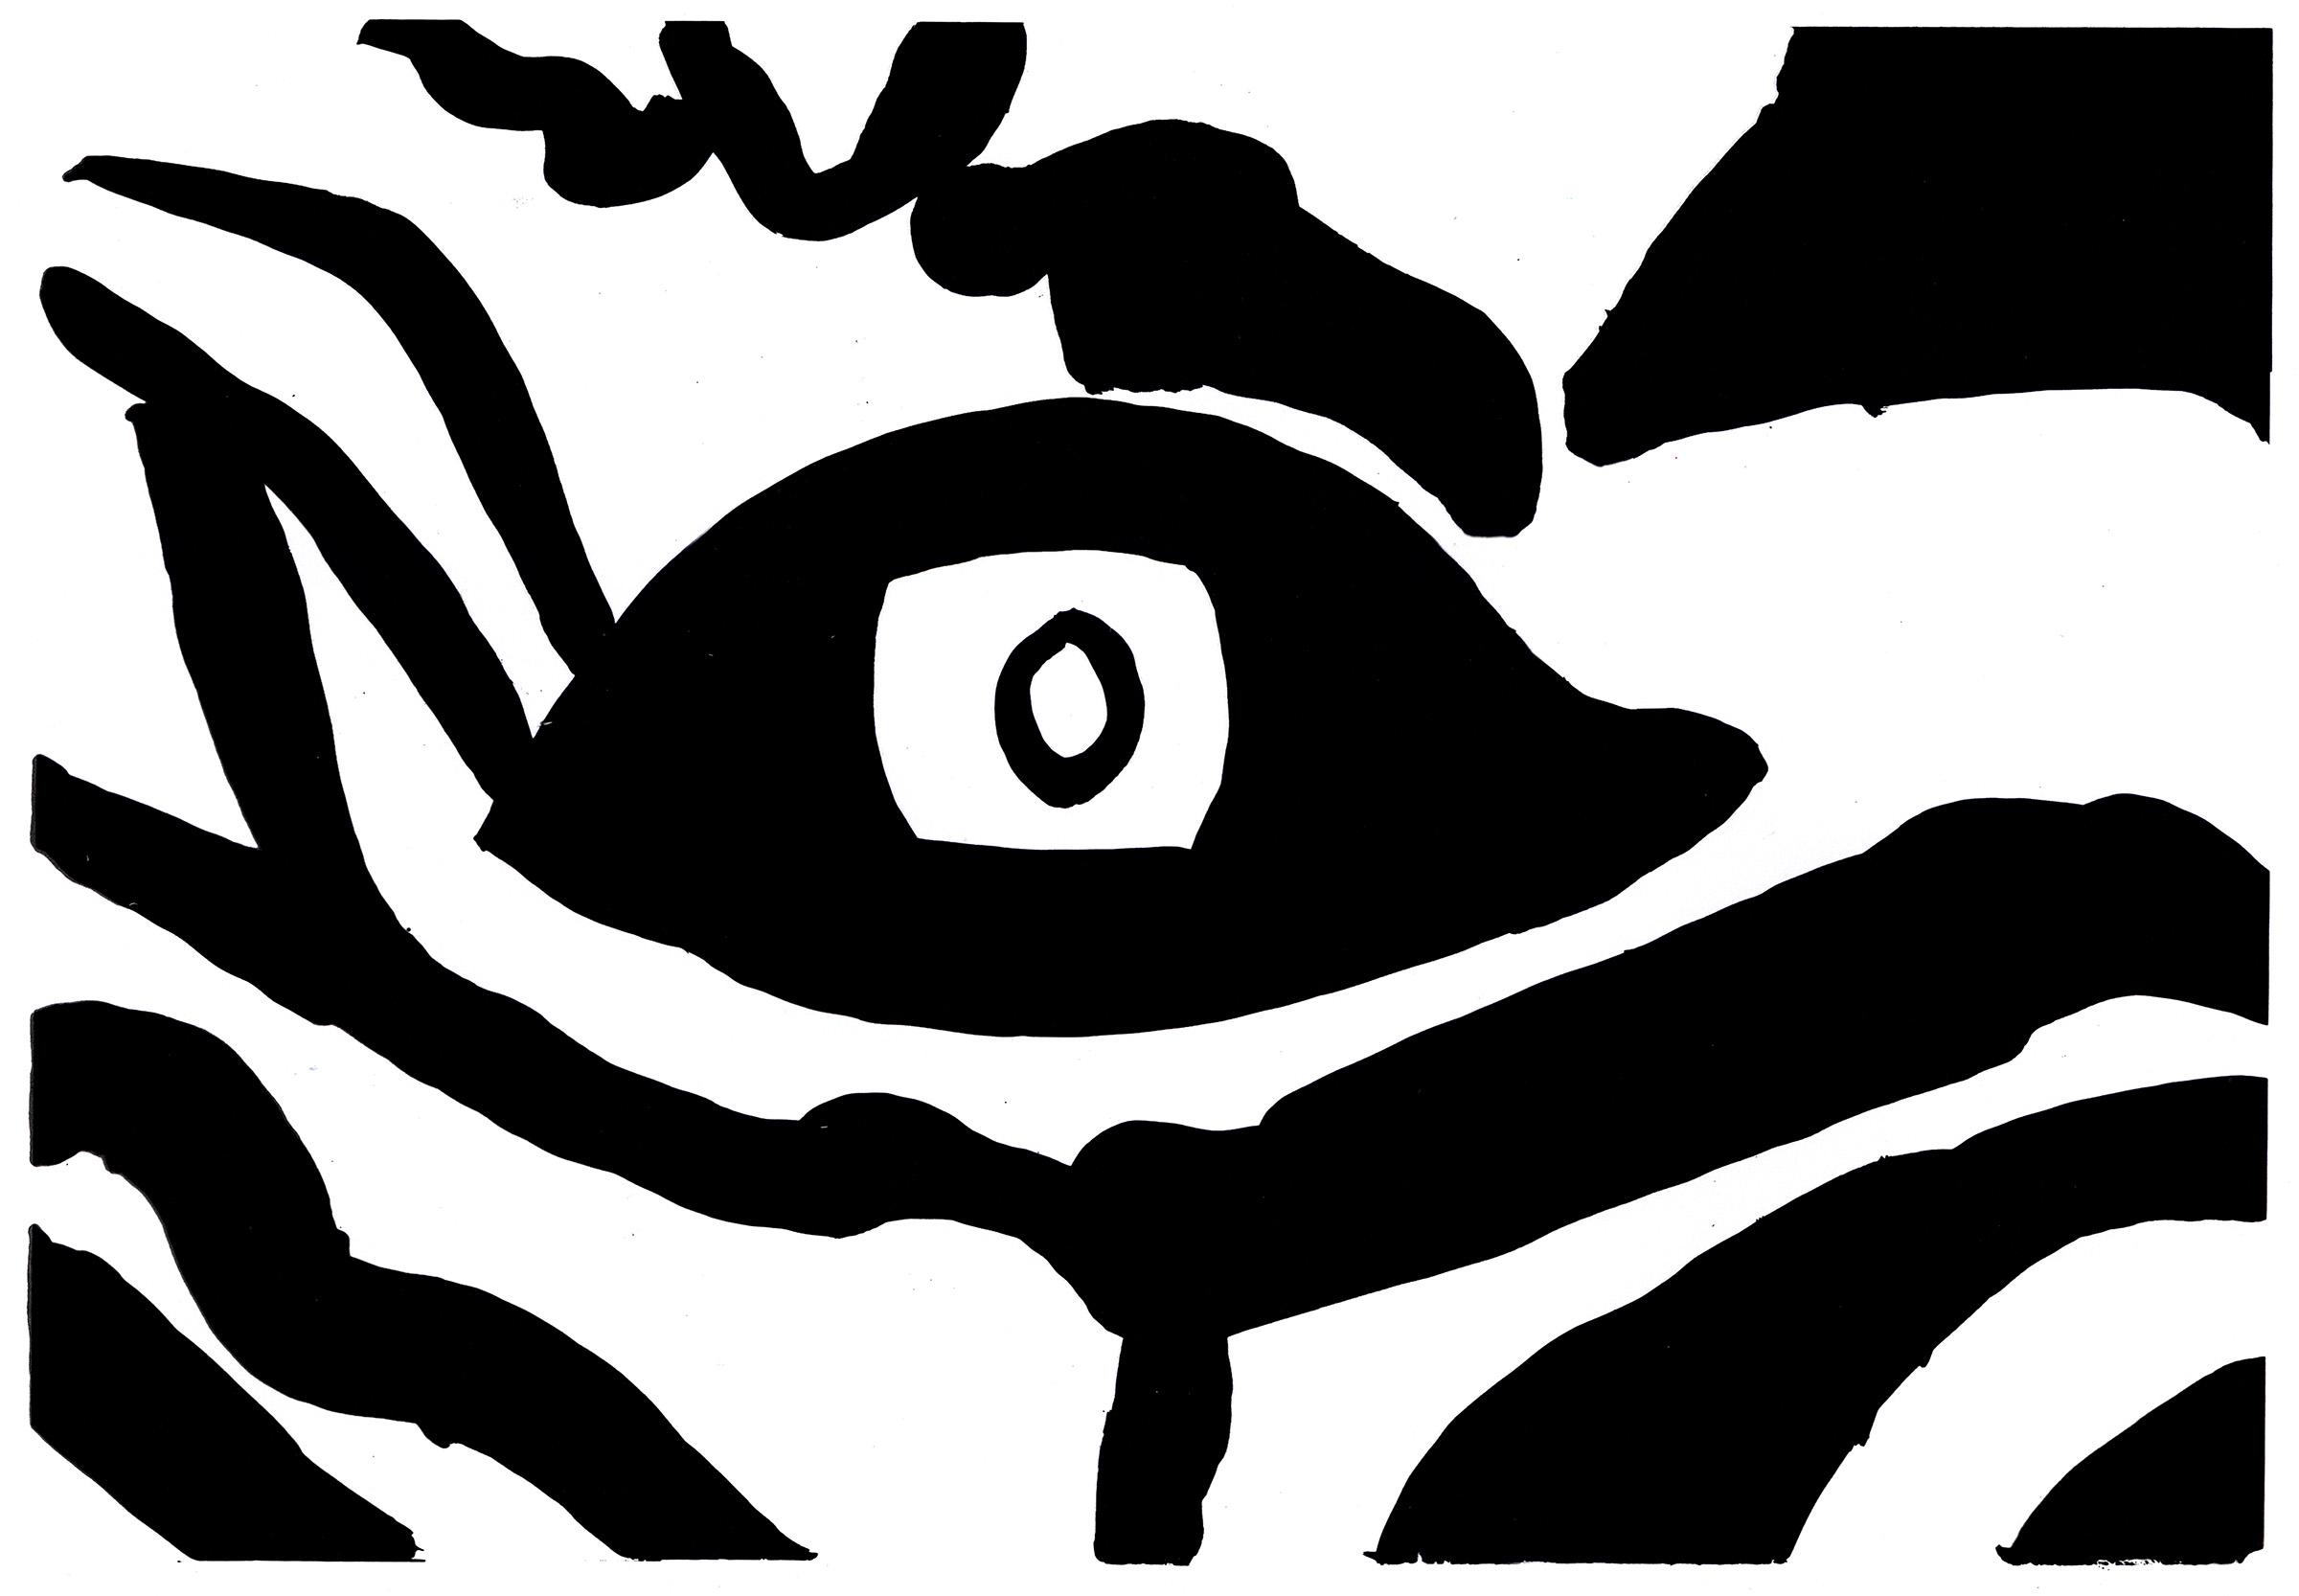 Ntiense Eno-Amooquaye Zebra Eye Deco Crossing, 2019, Ink on paper (Ntiense Eno-Amooquaye 3)